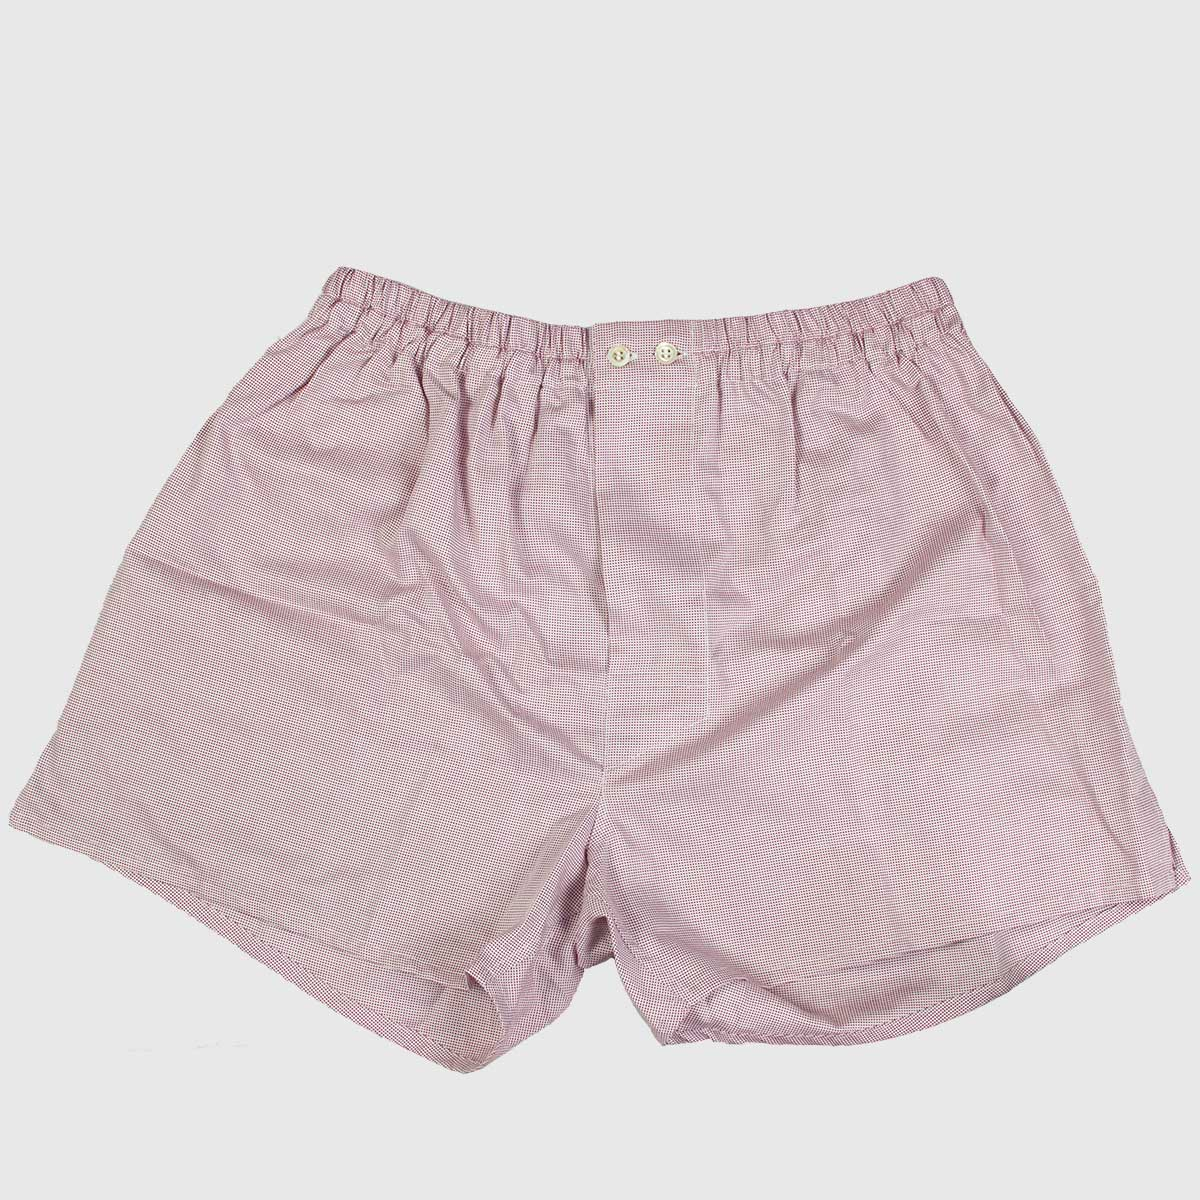 Men's underwear boxers birdseye